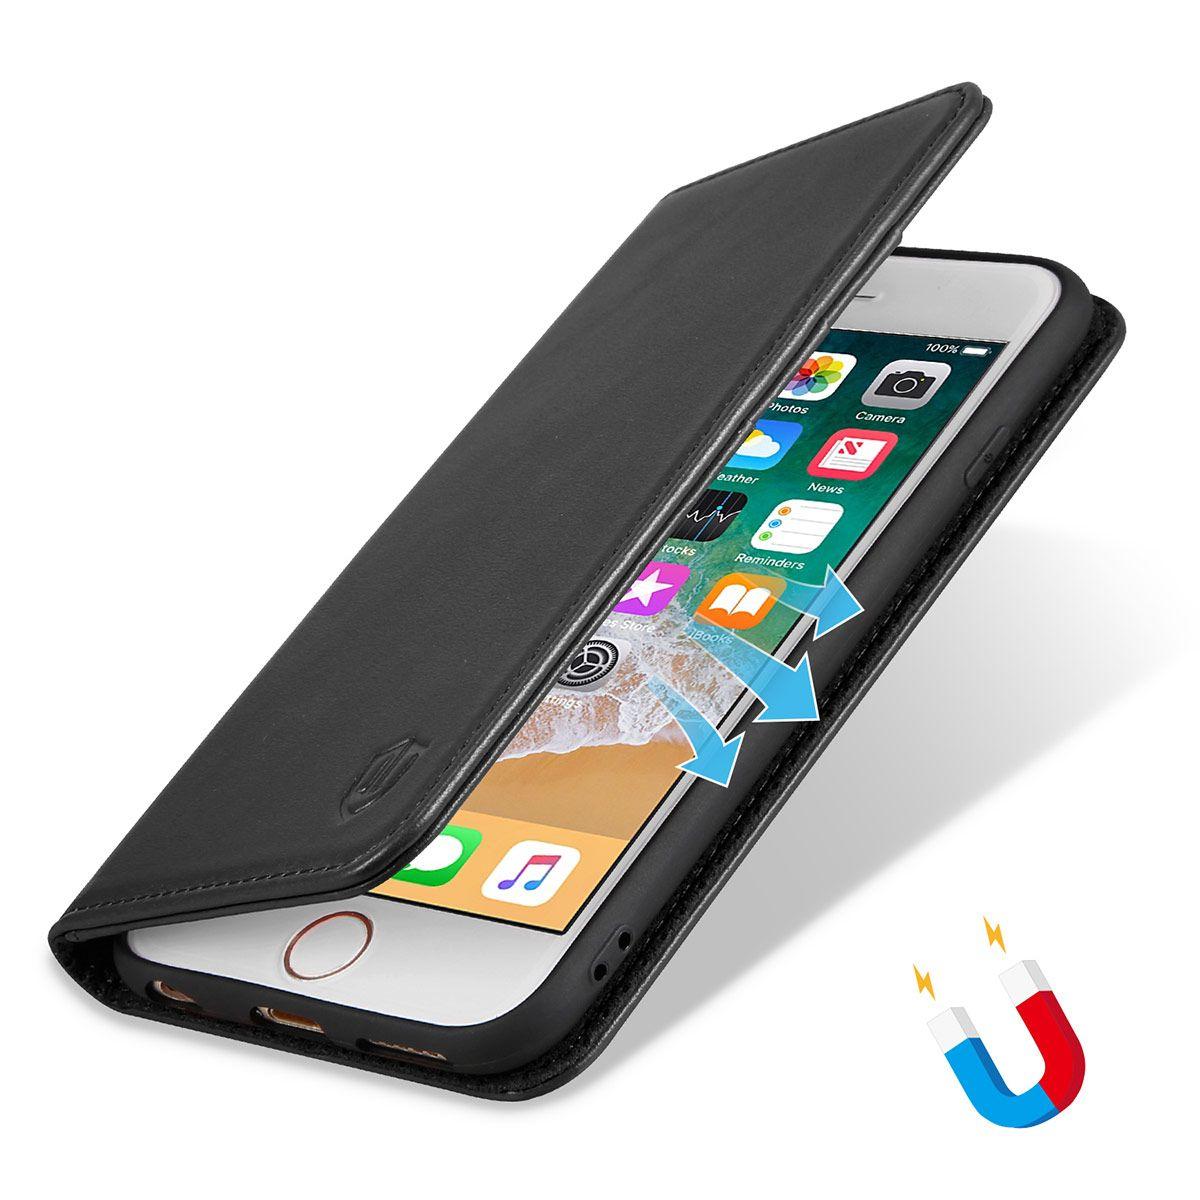 SHIELDON iPhone 6 Plus Folio Case - Genuine Leather Cover